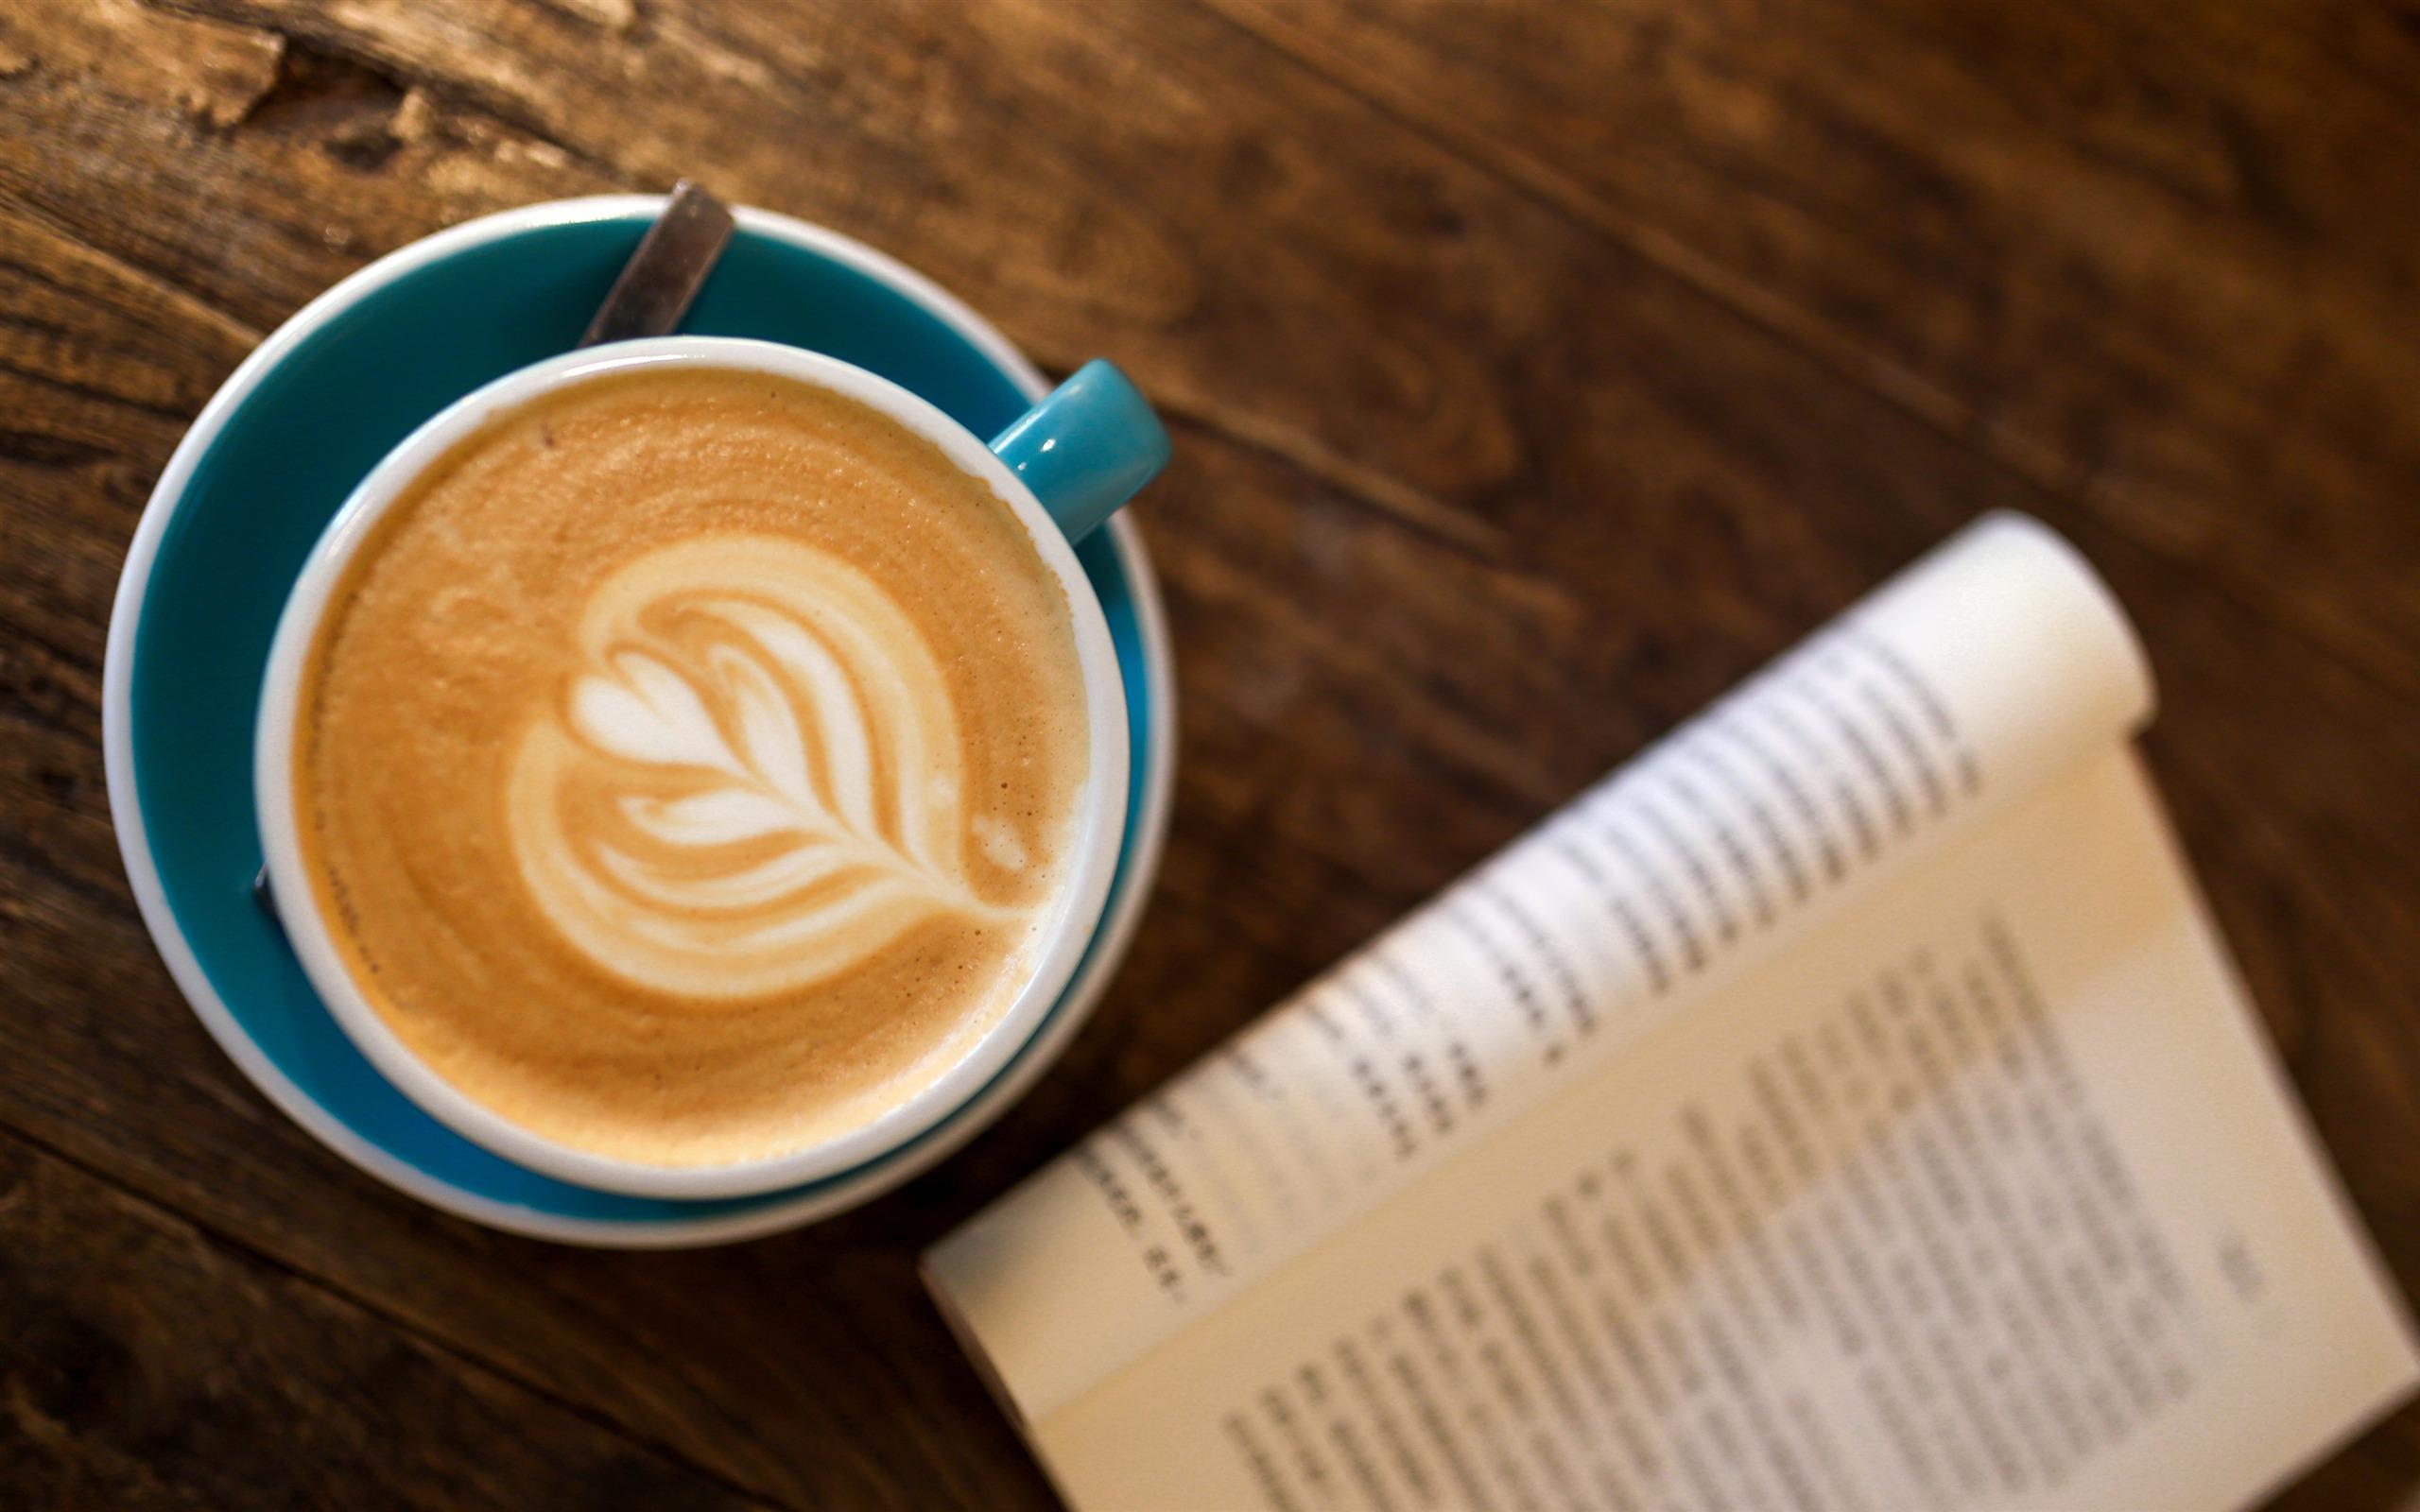 Cappuccino Mocha Coffee Reading Book Preview 10wallpaper Com